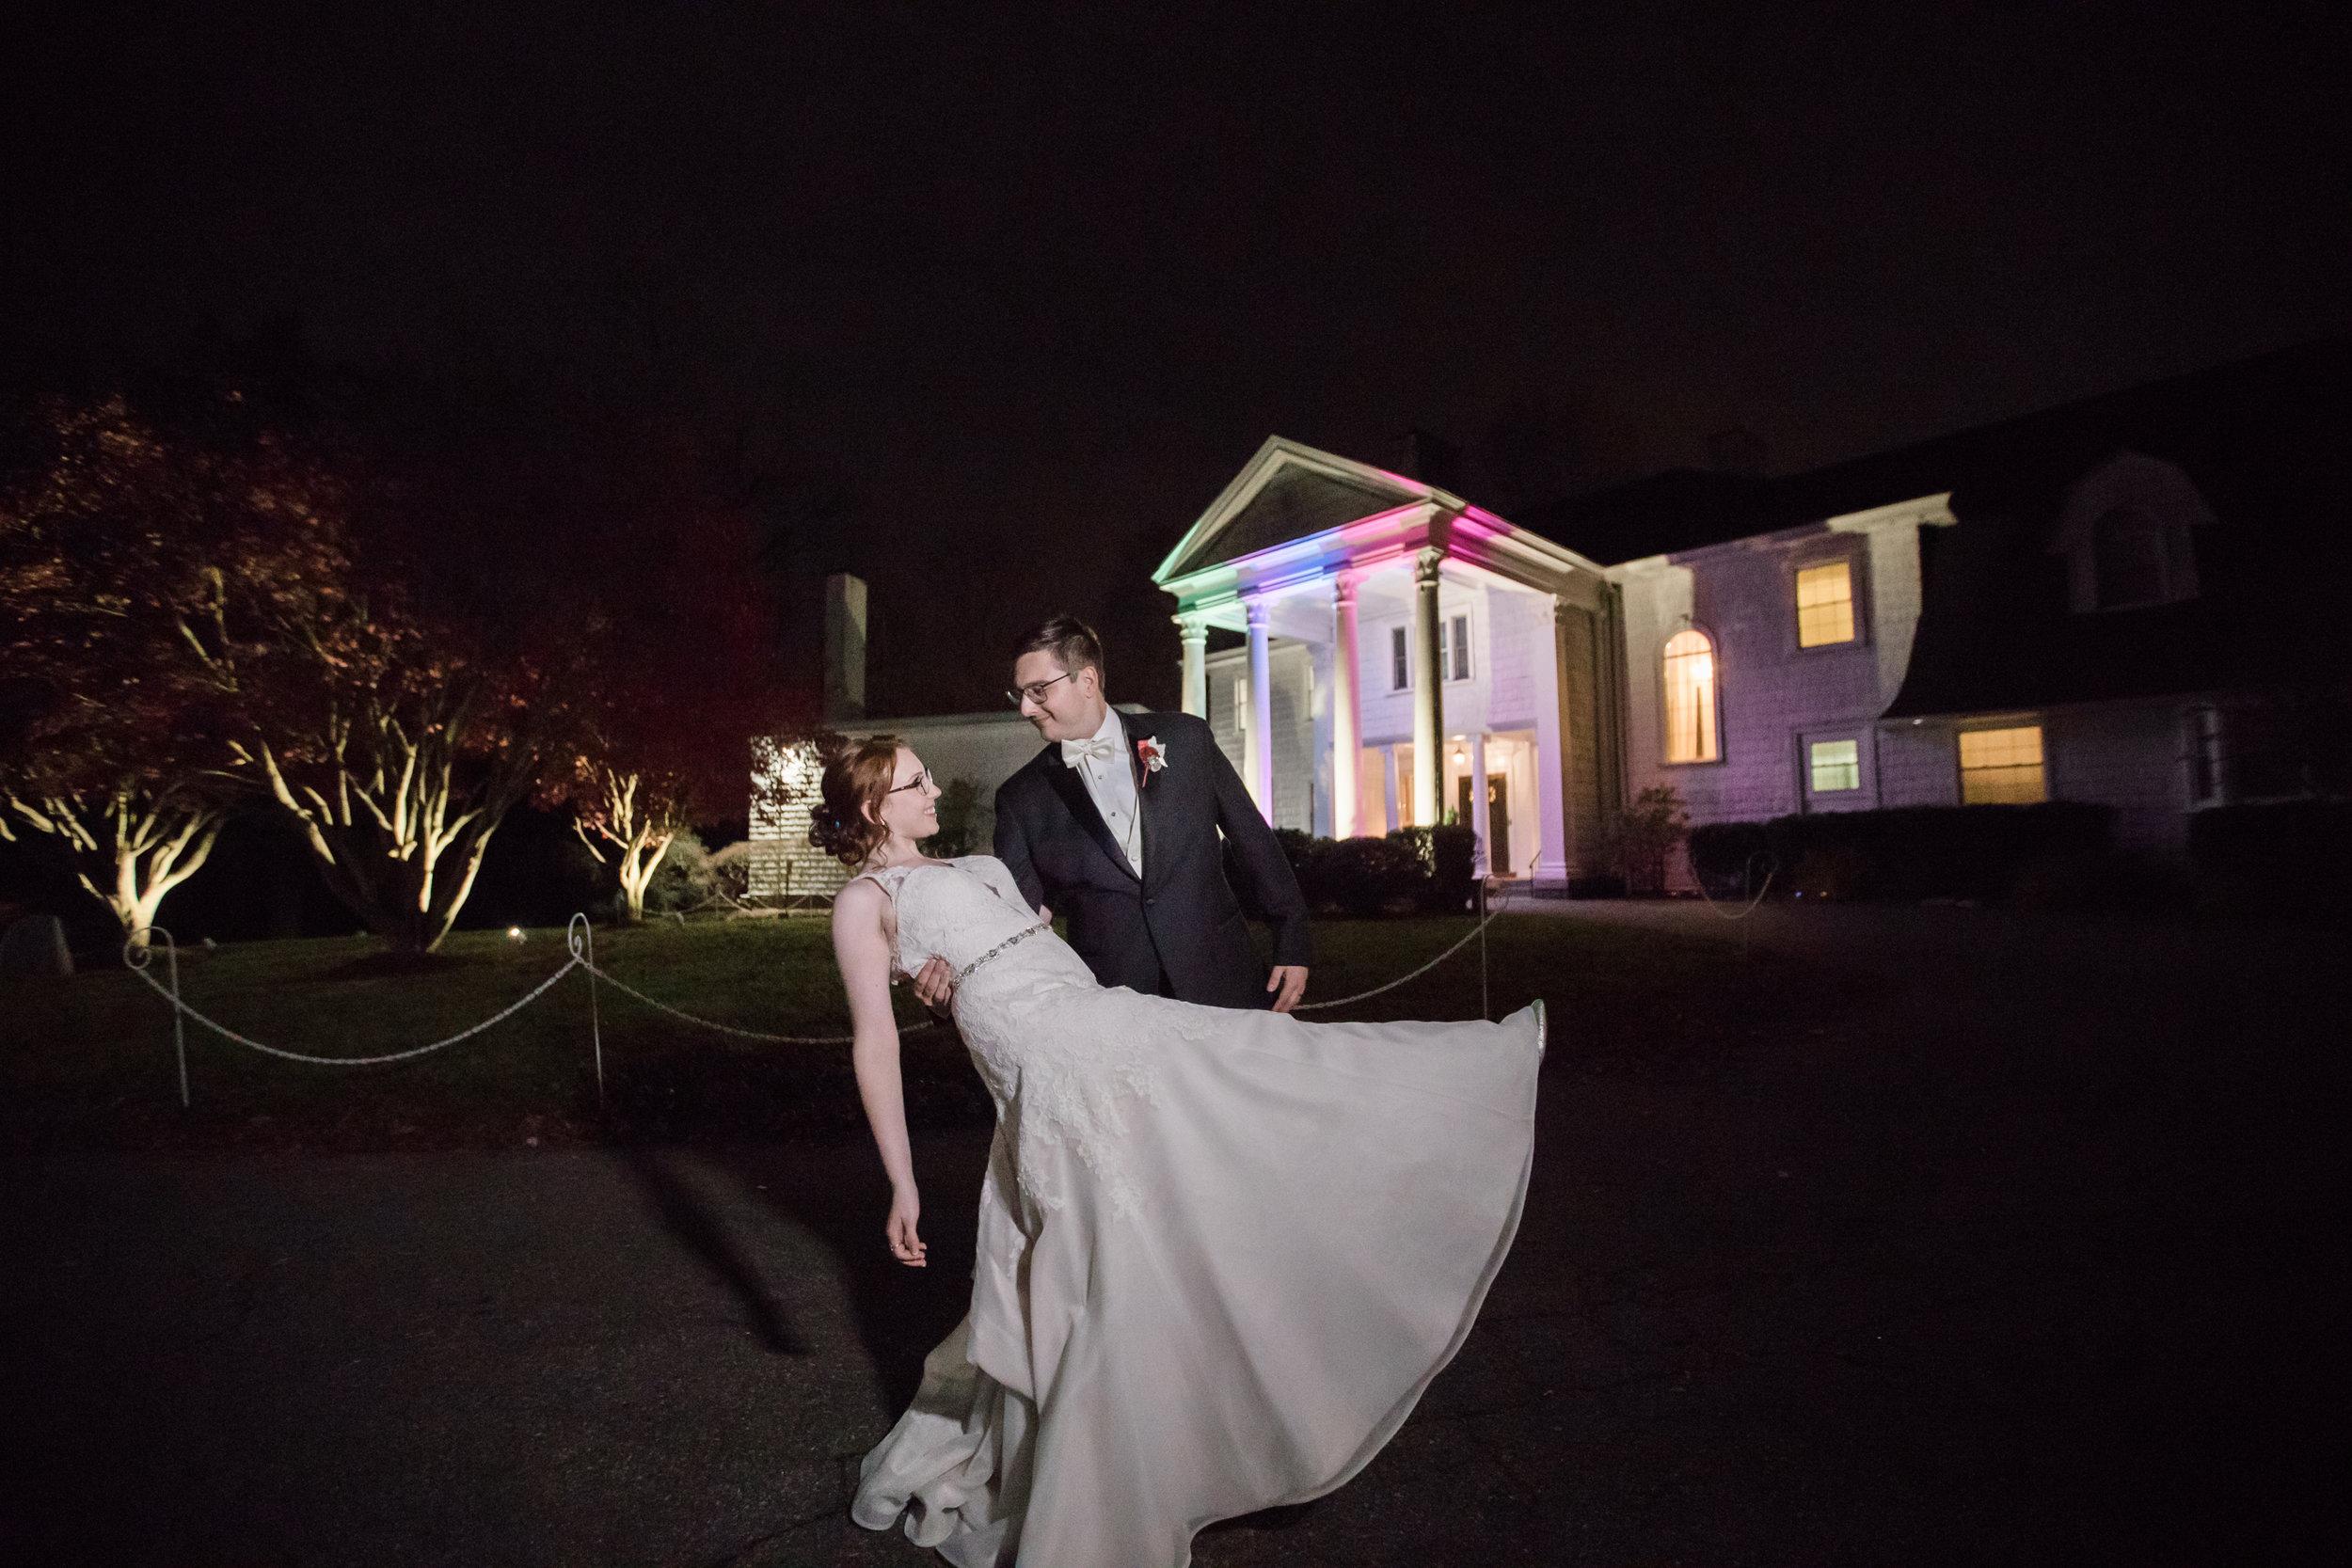 Harry Potter Wedding at Overhills Mansion Catonville Maryland Wedding Photographers Megapixels Media (113 of 134).jpg